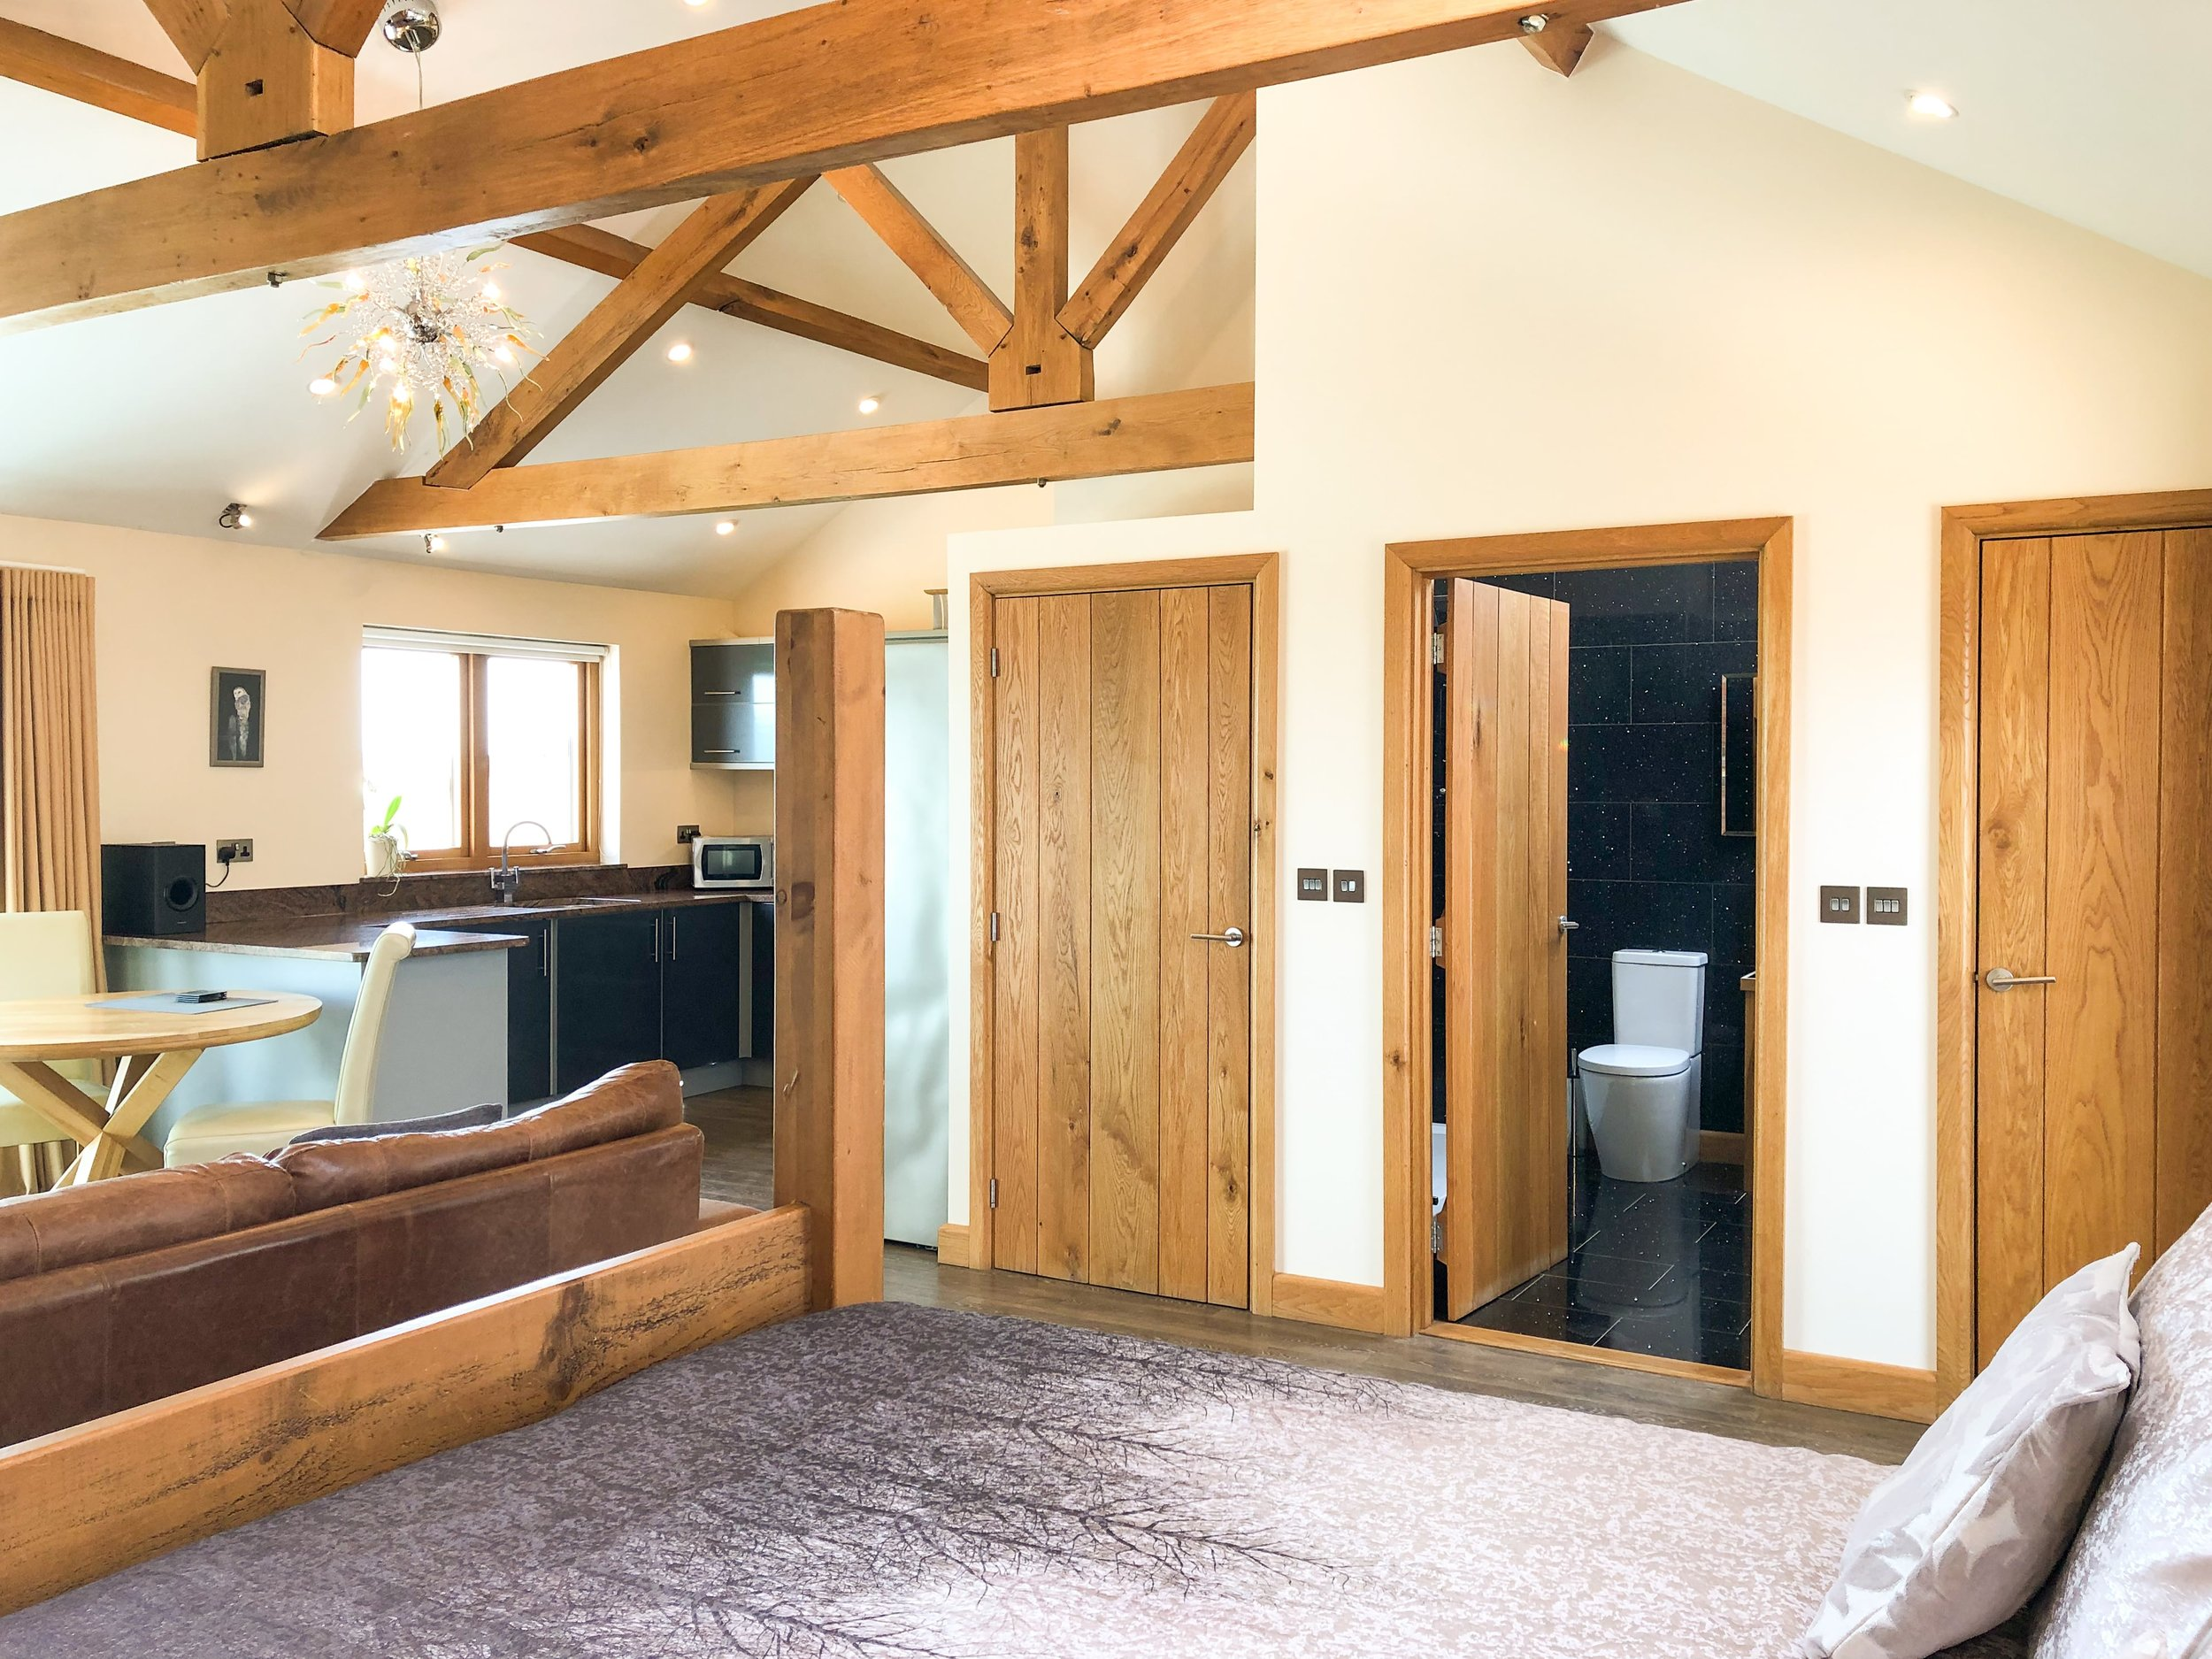 Bedroom area with en-suite bathroom